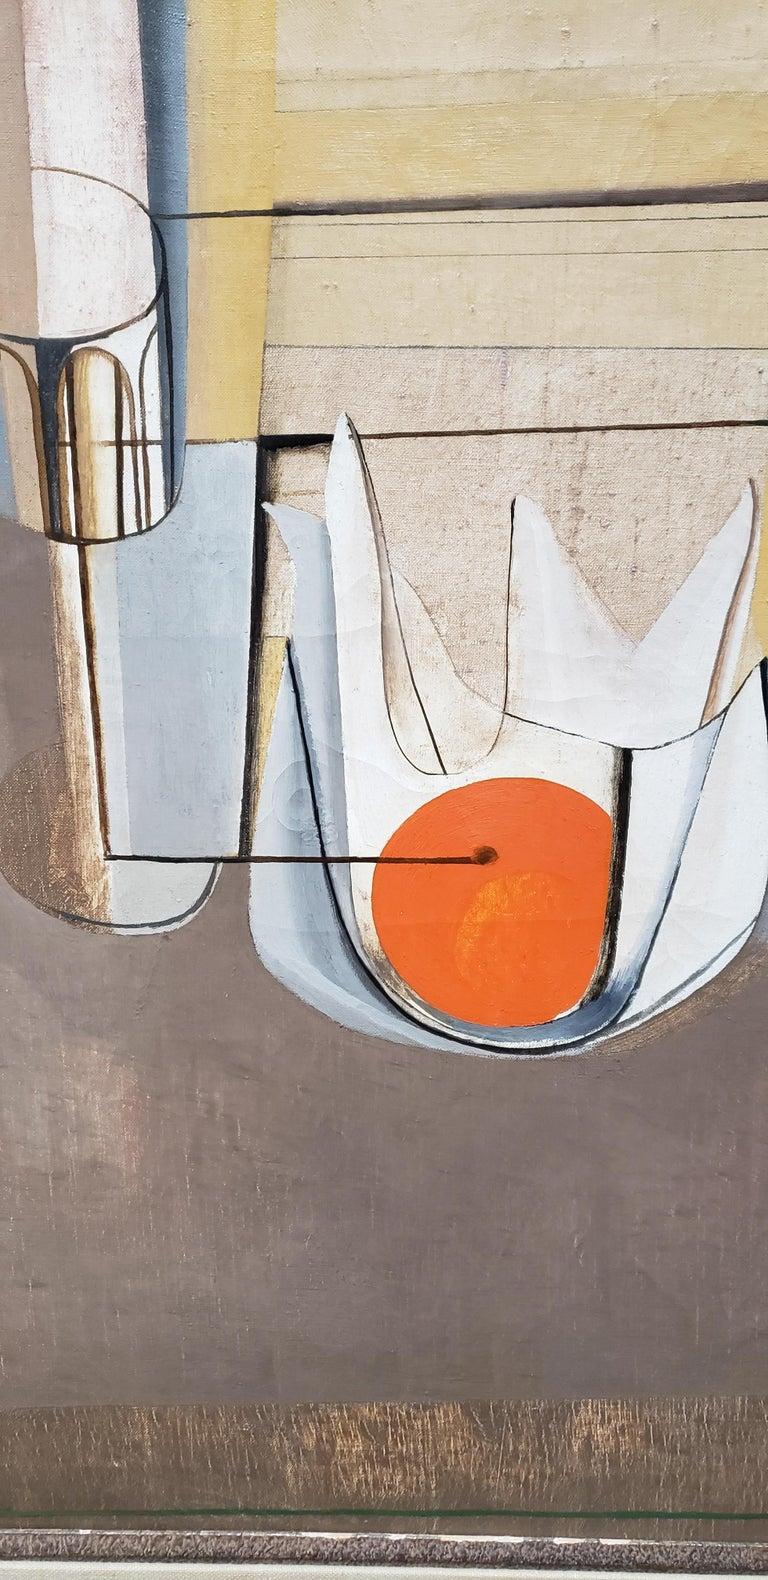 20th Century Joseph Mellor Hanson, Still Life with an Orange Oil on Canvas, 1956 For Sale